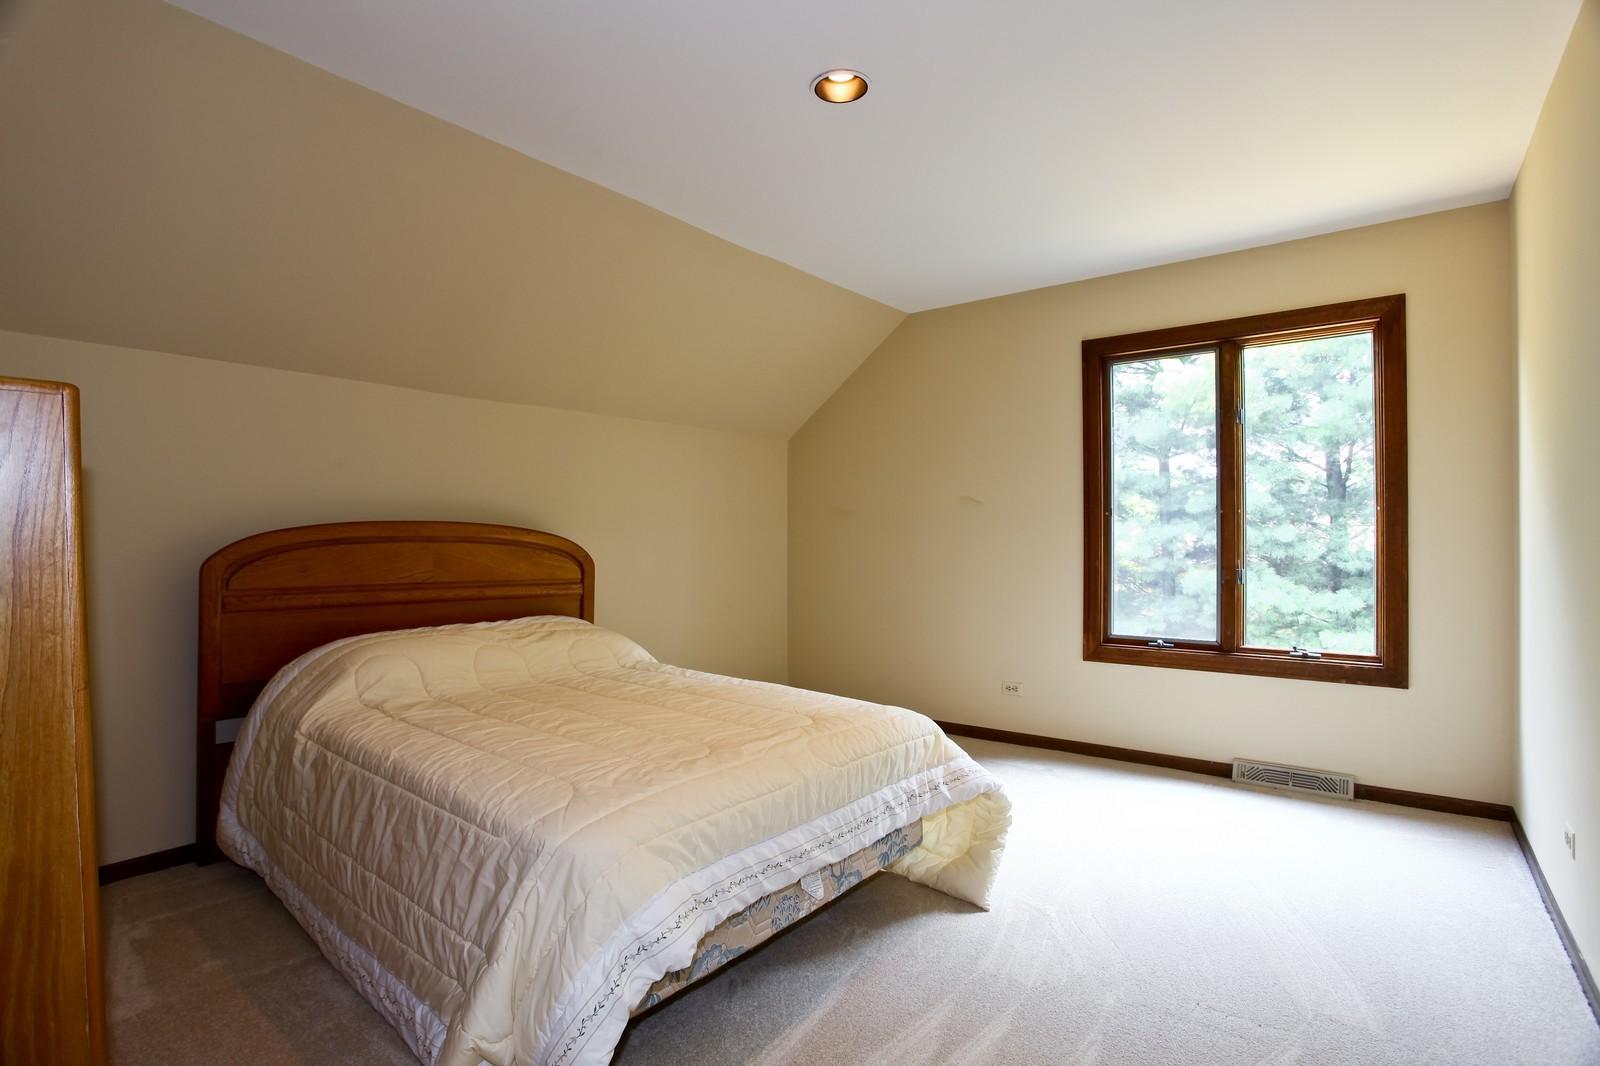 Real Estate Photography - 5N300 Sundance, Saint Charles, IL, 60175 - Bedroom